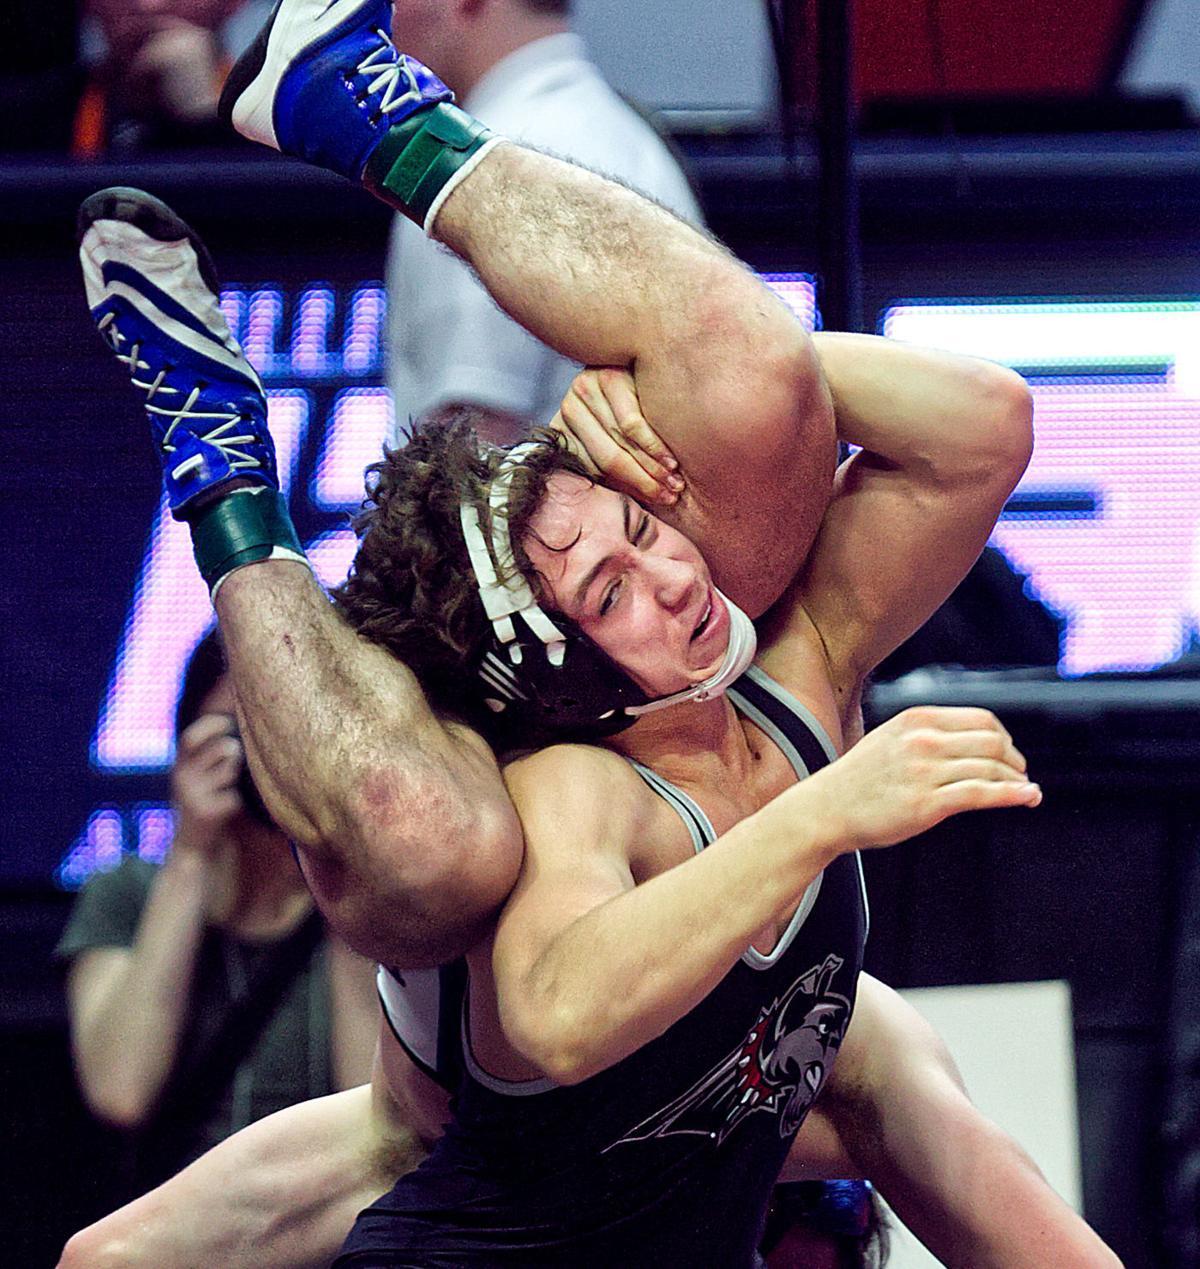 20_State-Wrestling_Sat_Medal_416.jpg